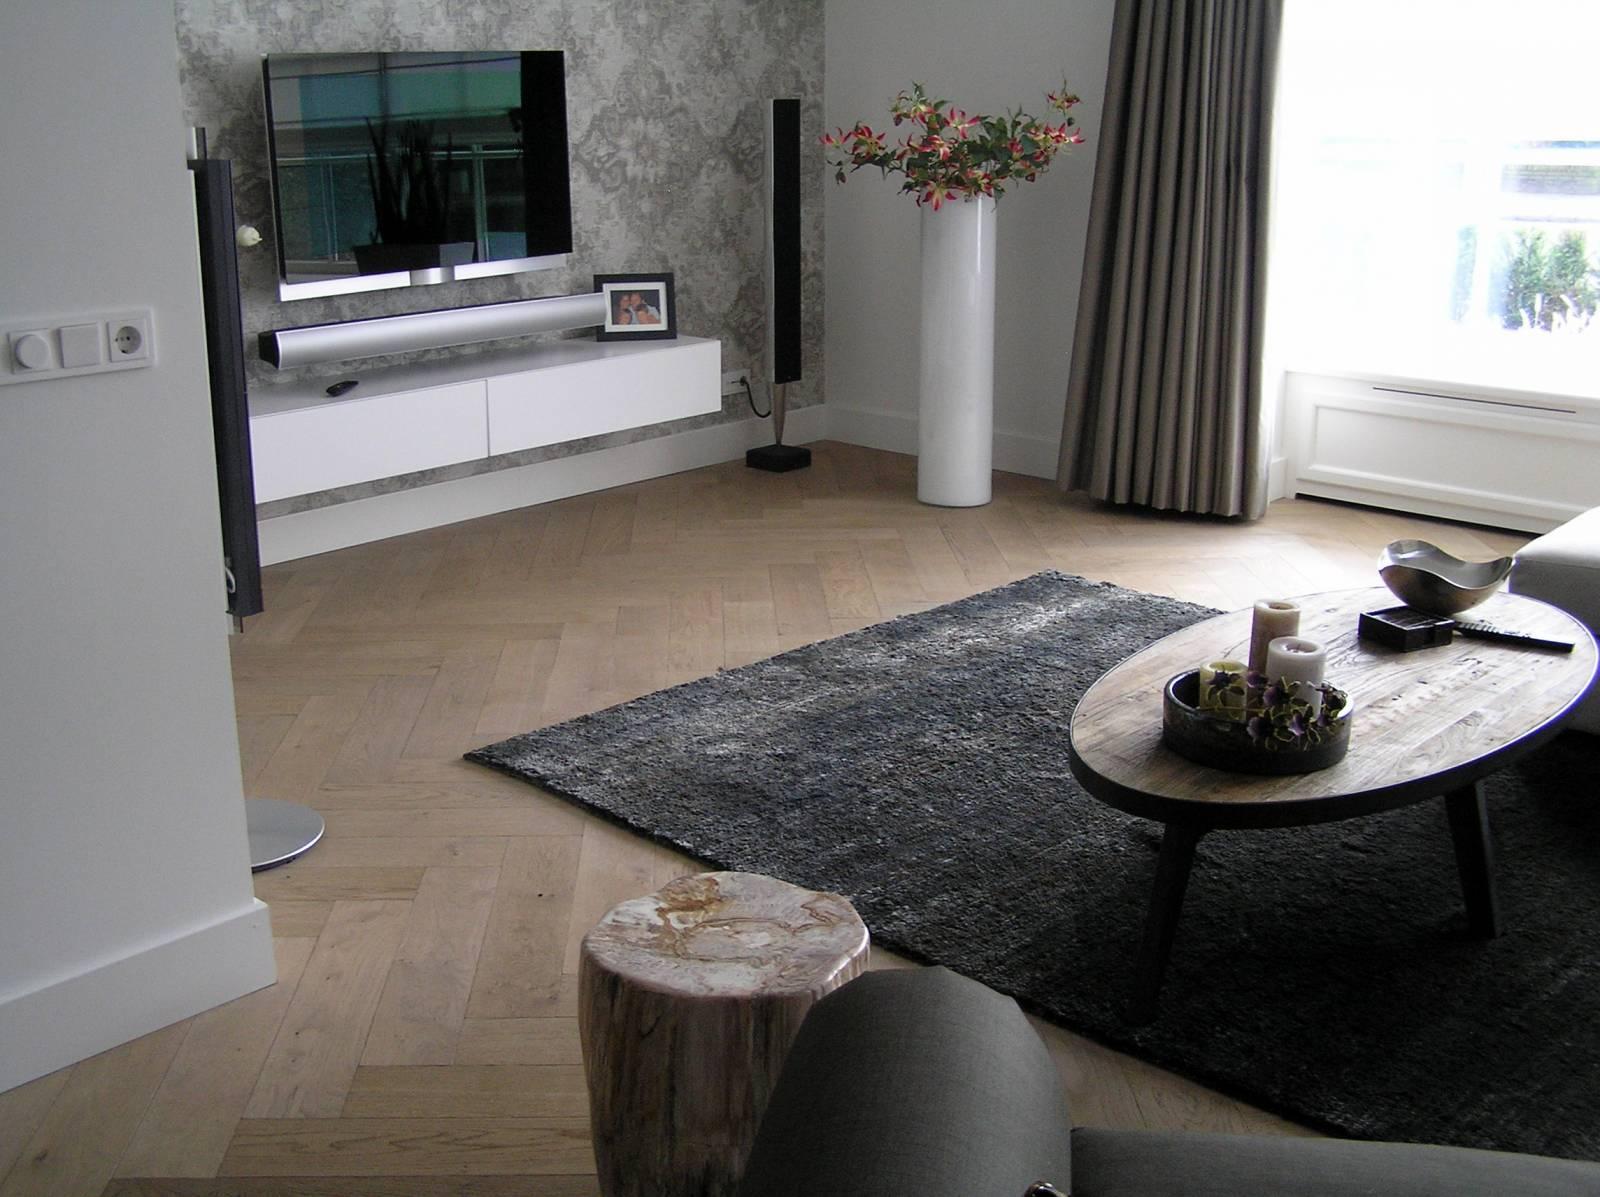 Chateau Vloeren Helmond : Natuursteen vloeren helmond natuursteen vloeren g van leeuwe b v